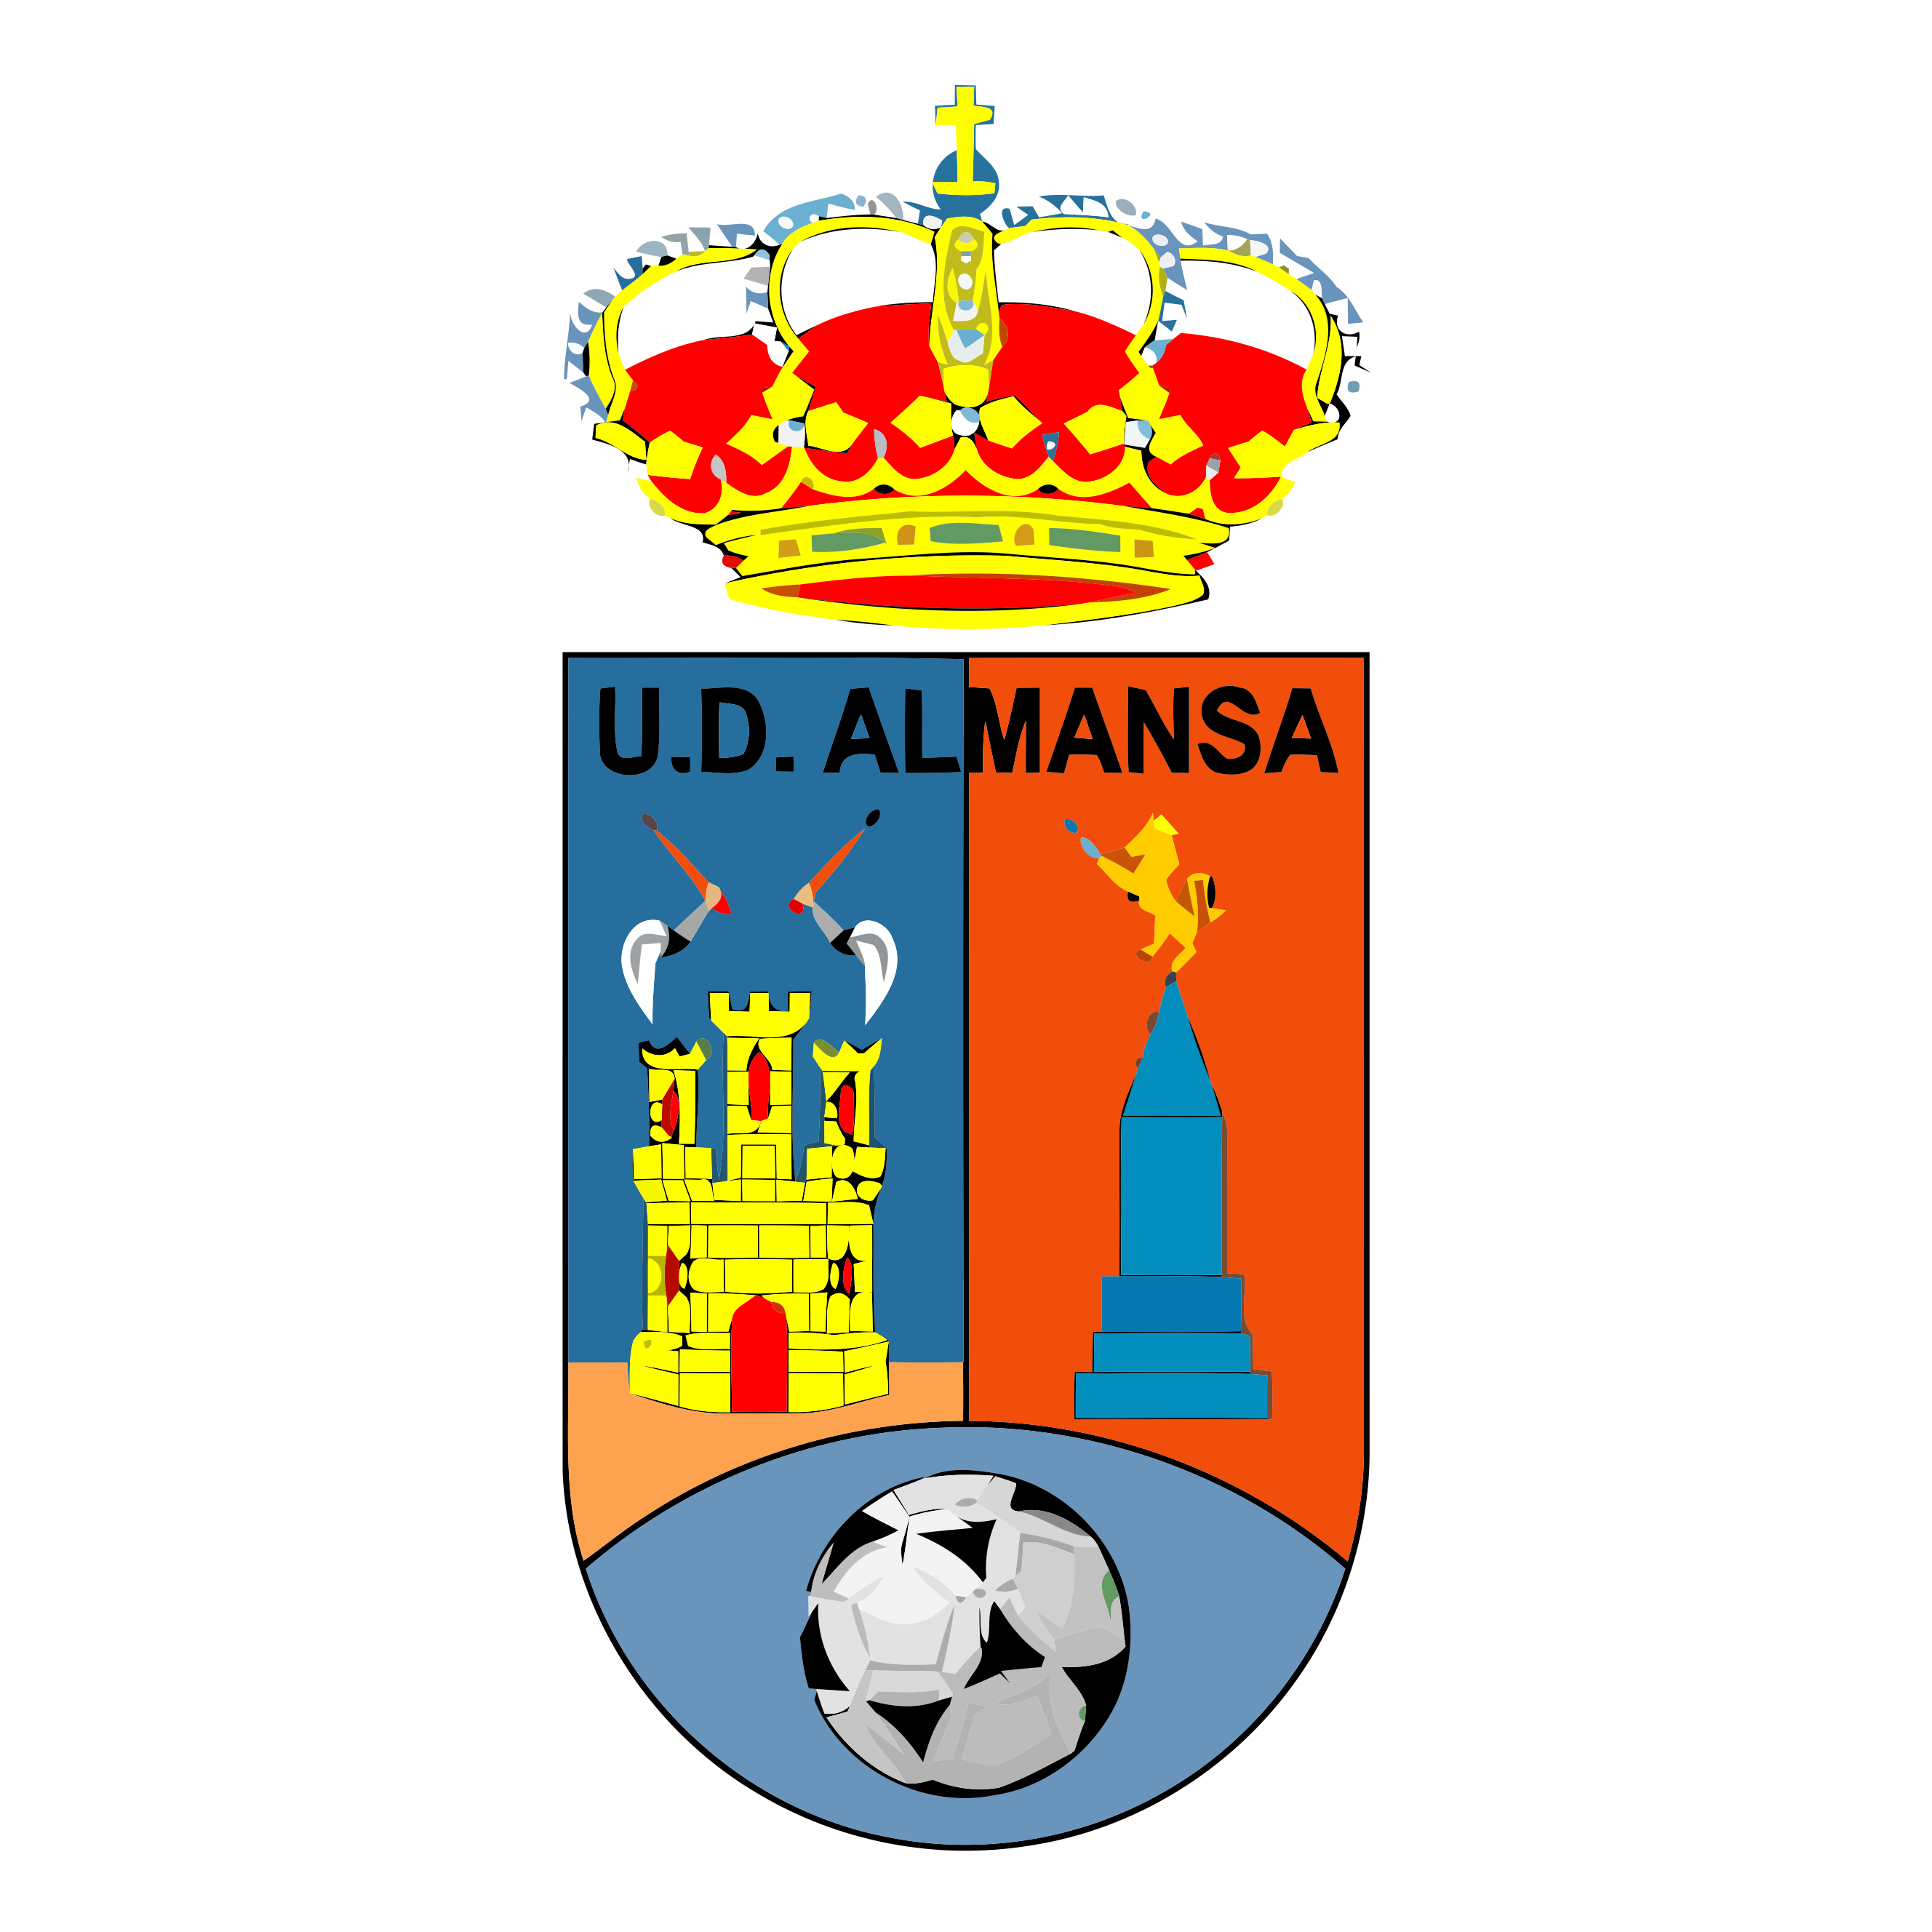 U.D. Almansa en el Trofeo Mar Menor 2019